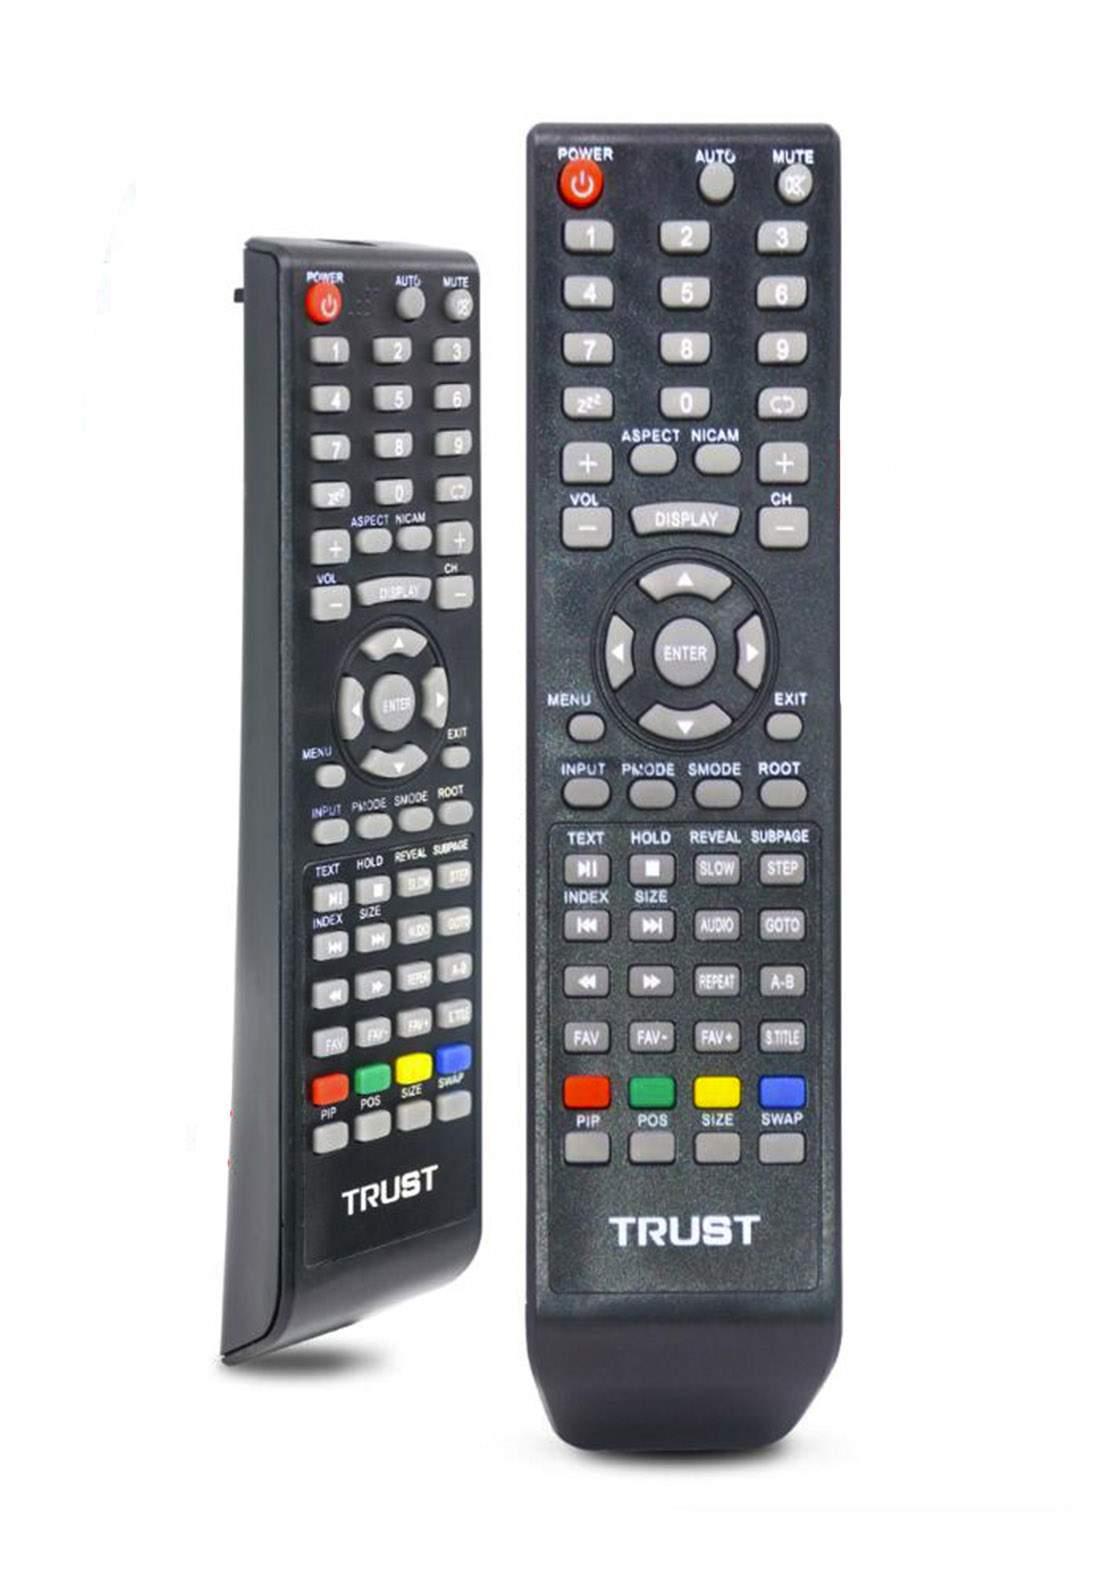 Remote Control For Trust Plasma TV (A-505) جهاز تحكم عن بعد